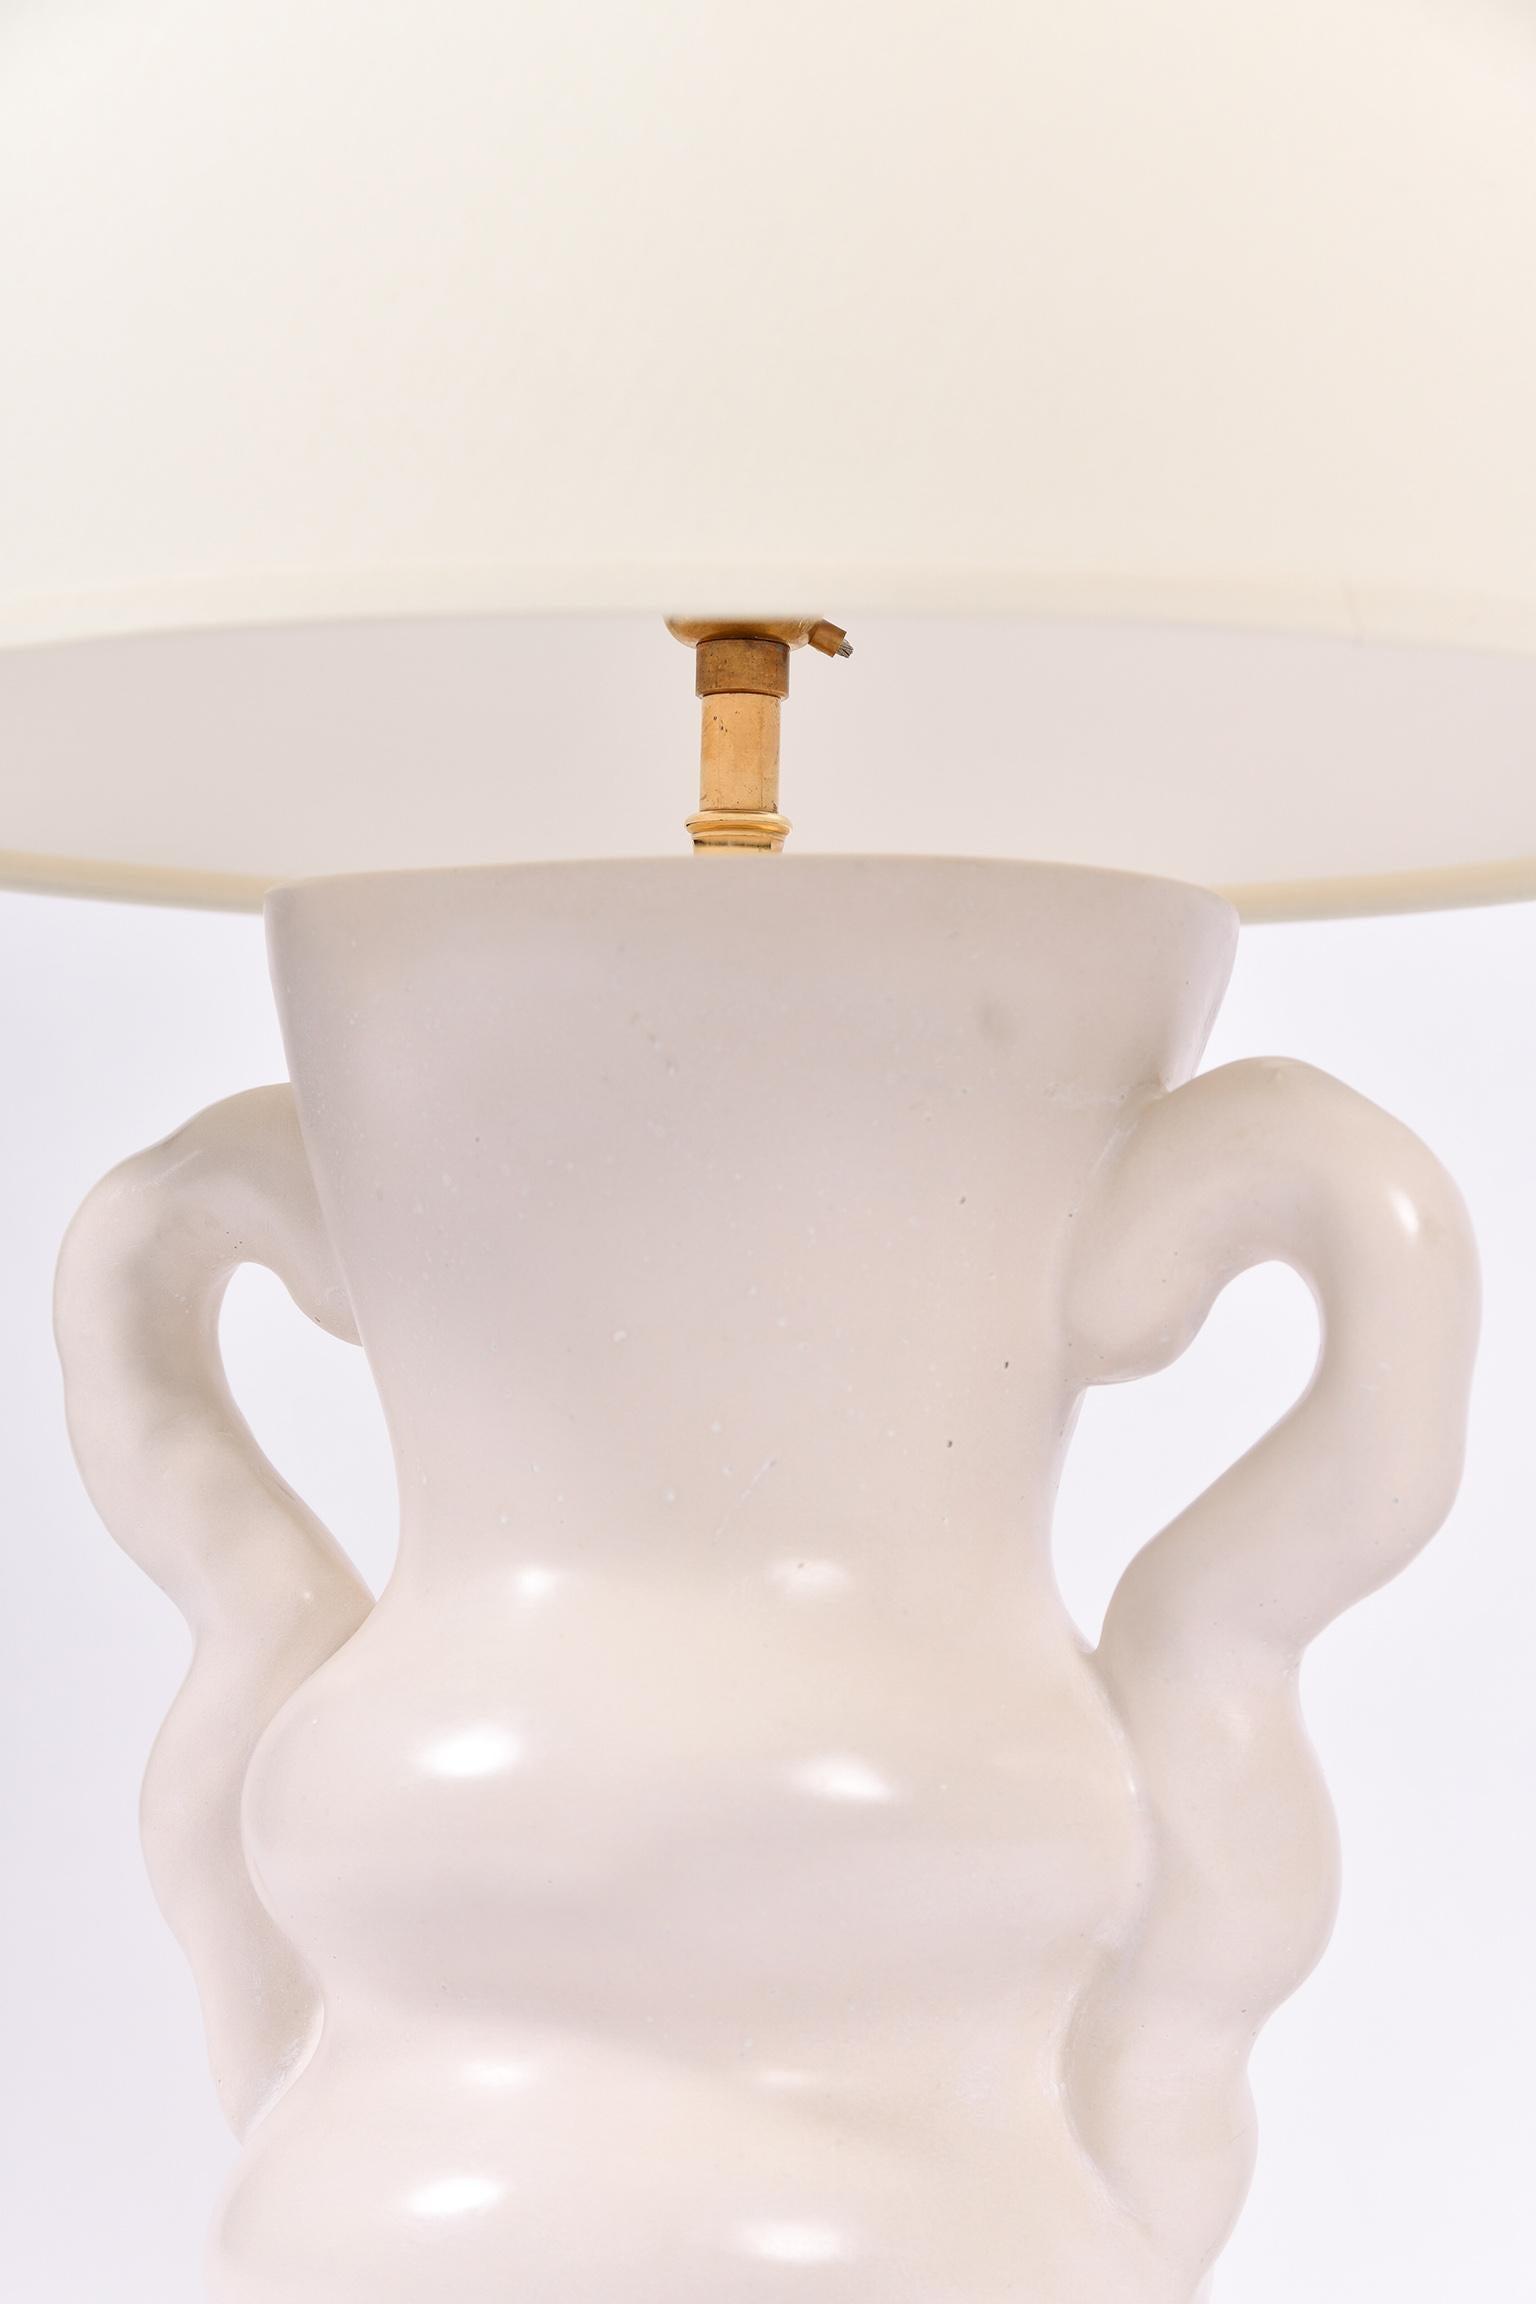 White Plaster Table Lamp, by Dorian